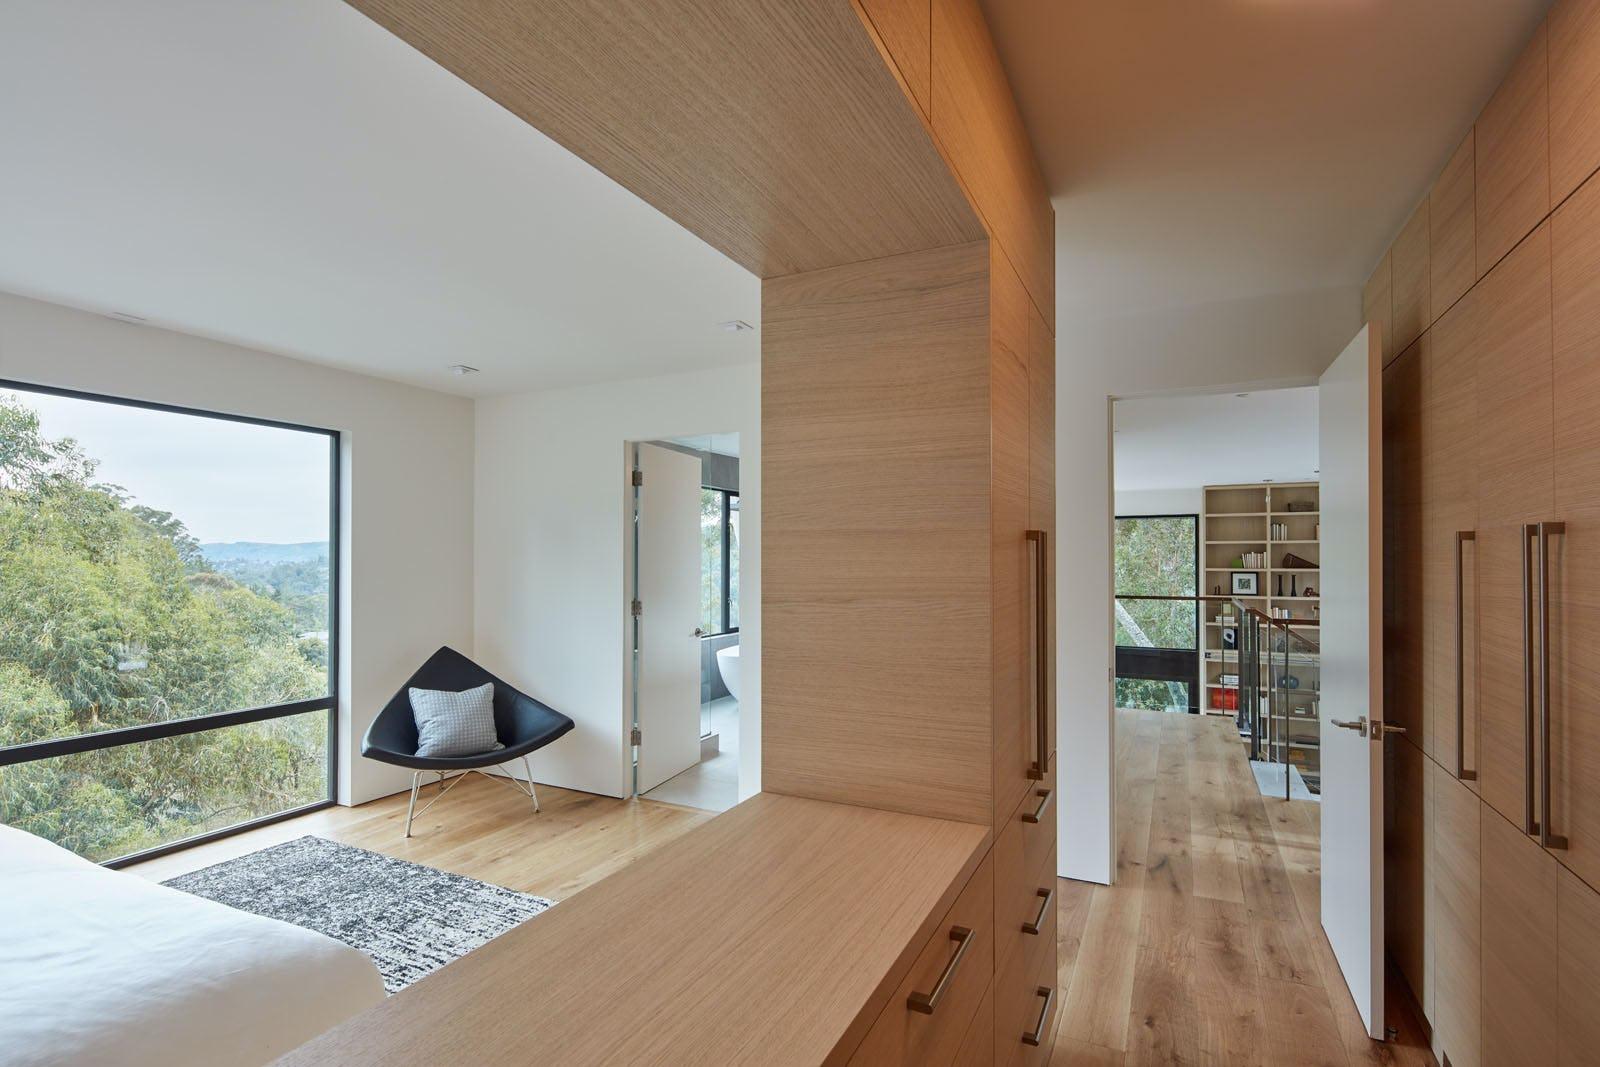 Builtform construction 441tamresidence full room divided upstairs modern wood smaller